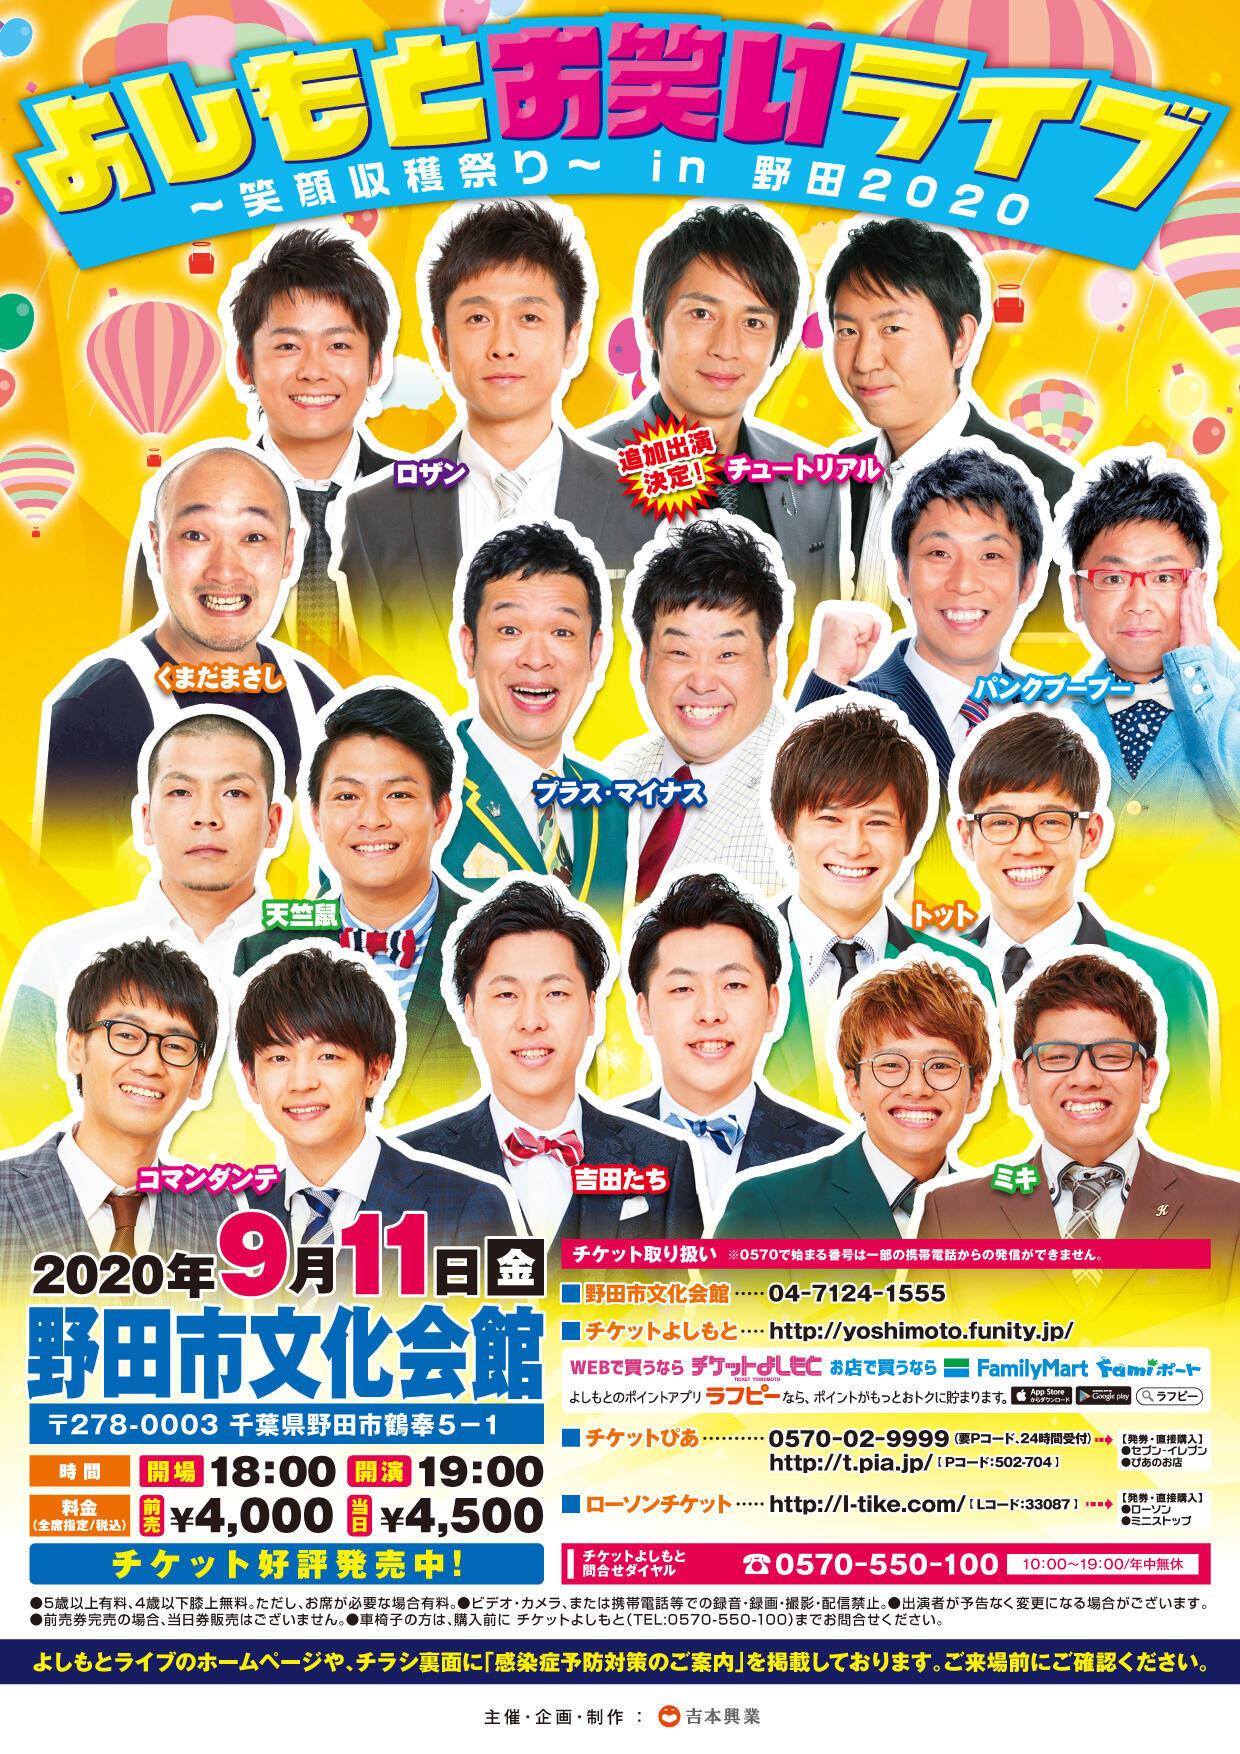 http://www.syumatsu.jp/20200815142221-a9cb3de694b2a31d952a3c31063656a520e192f3.jpg